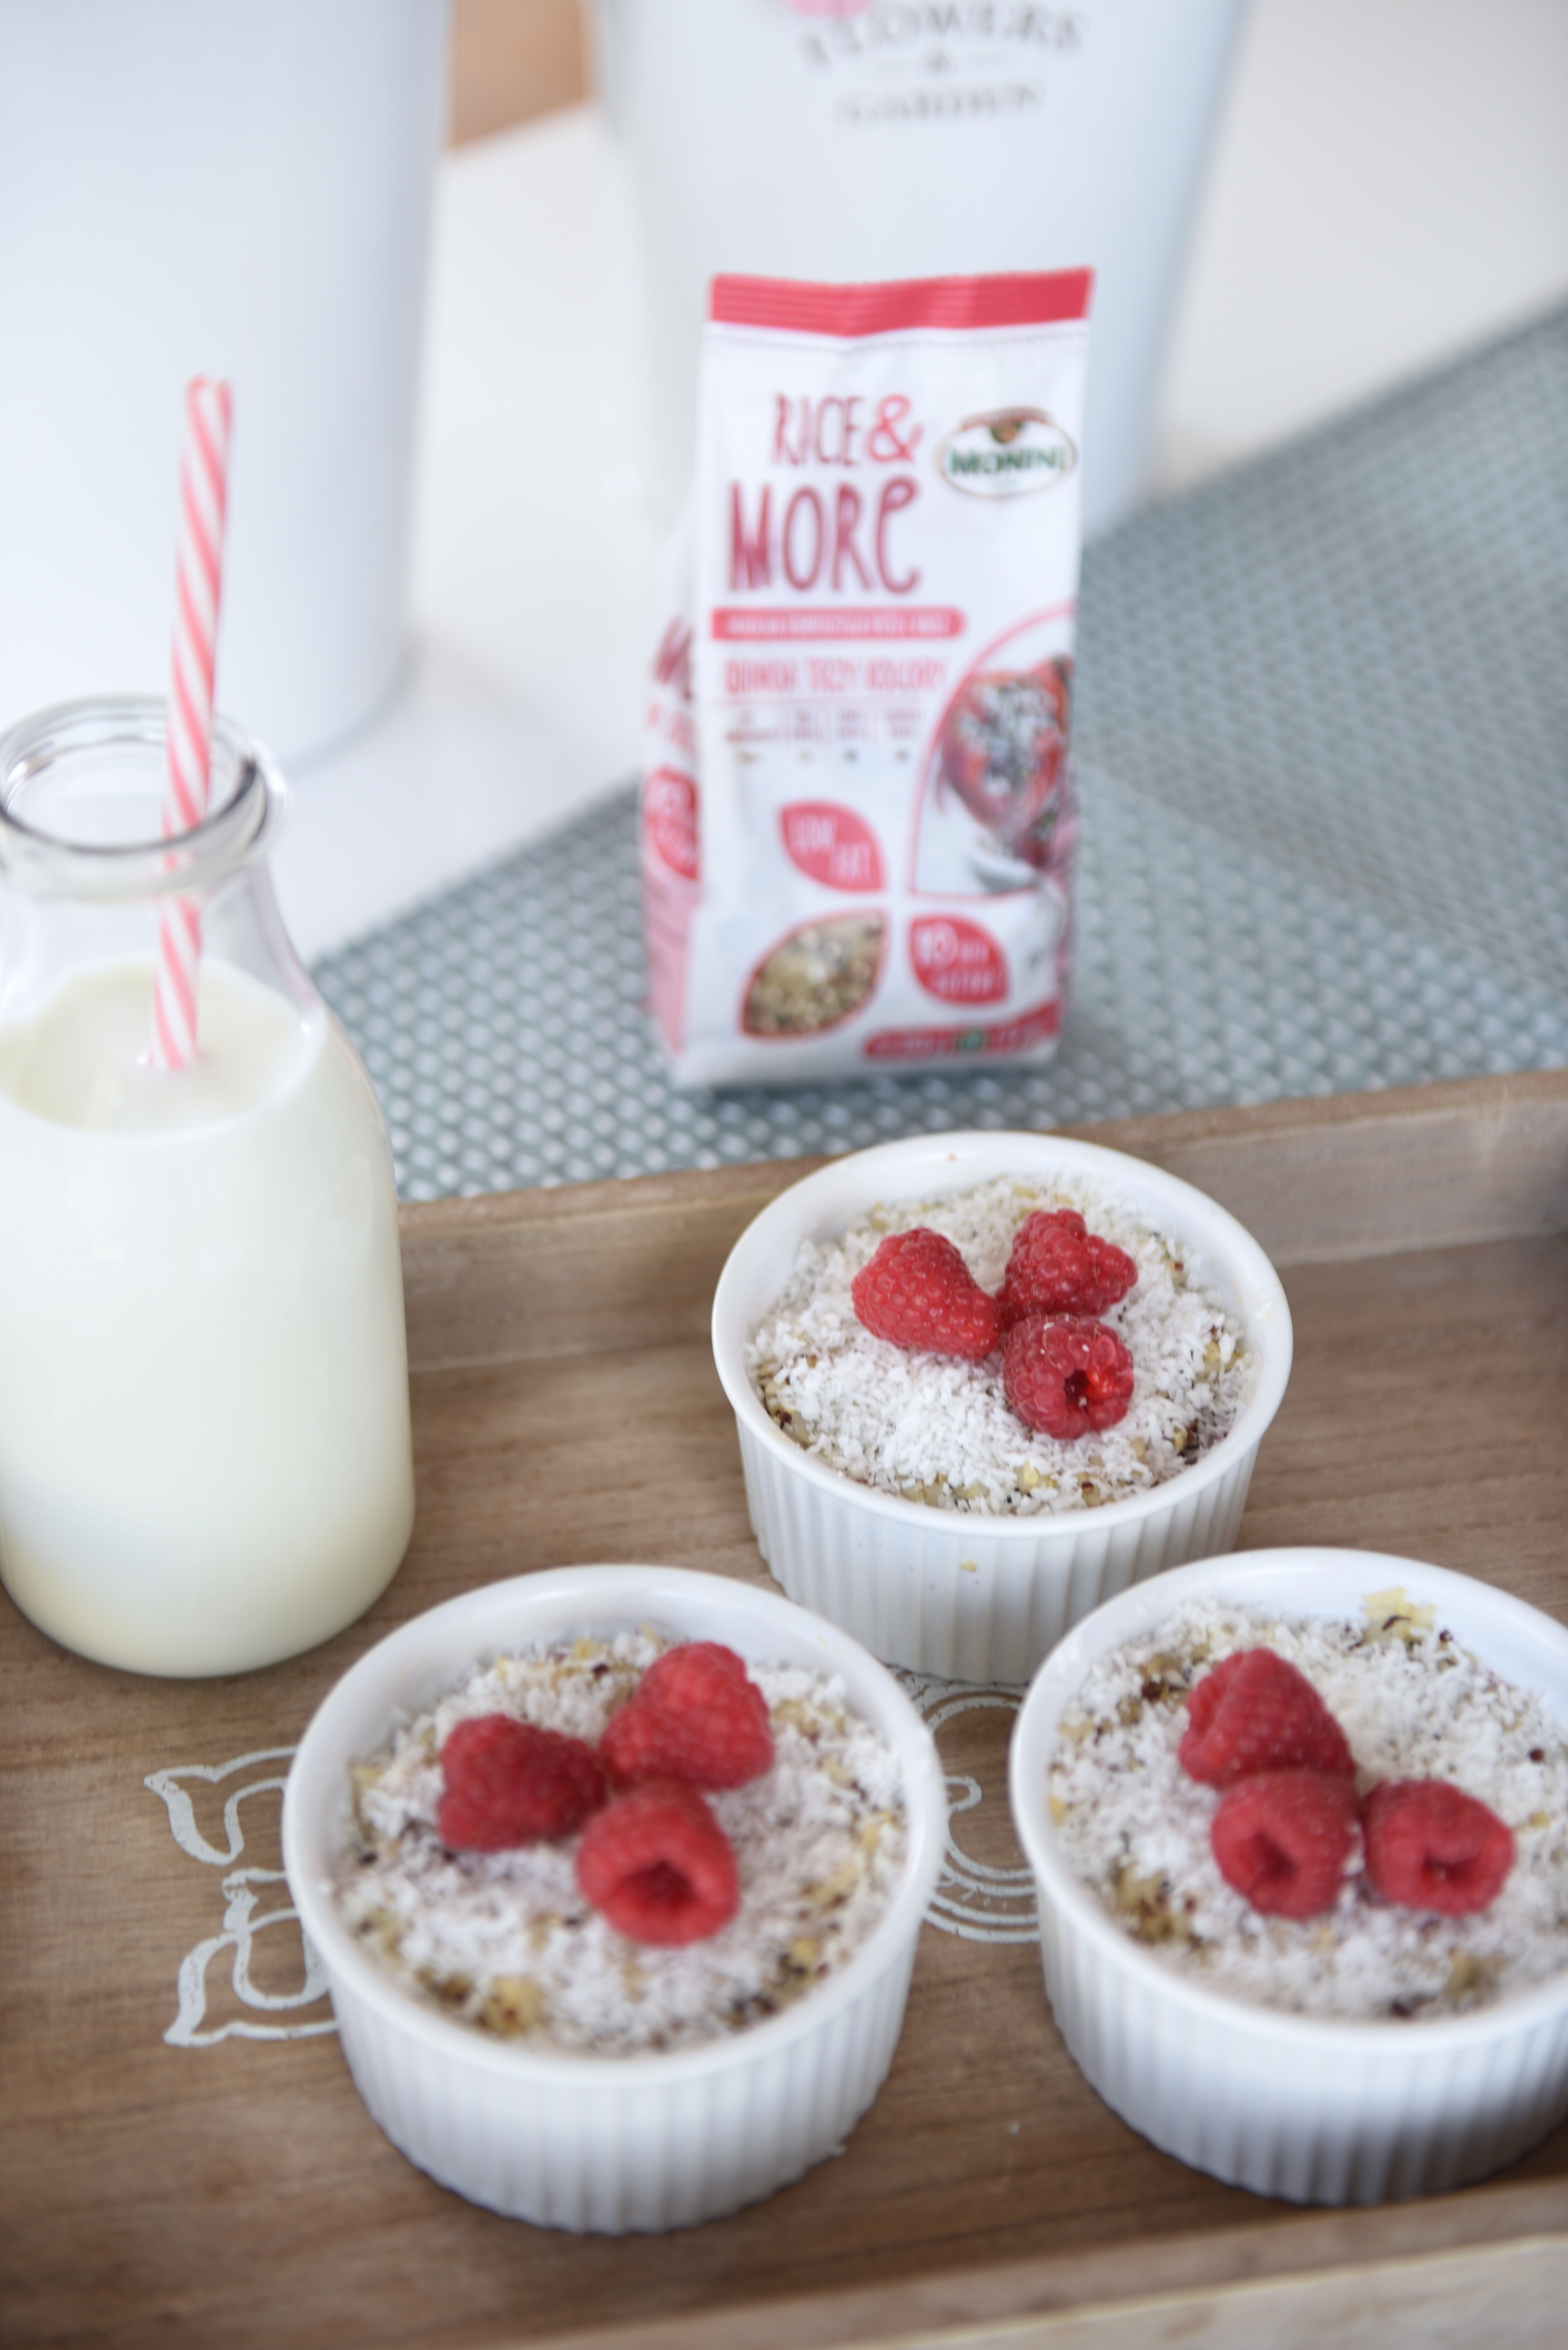 quinoa rice and more